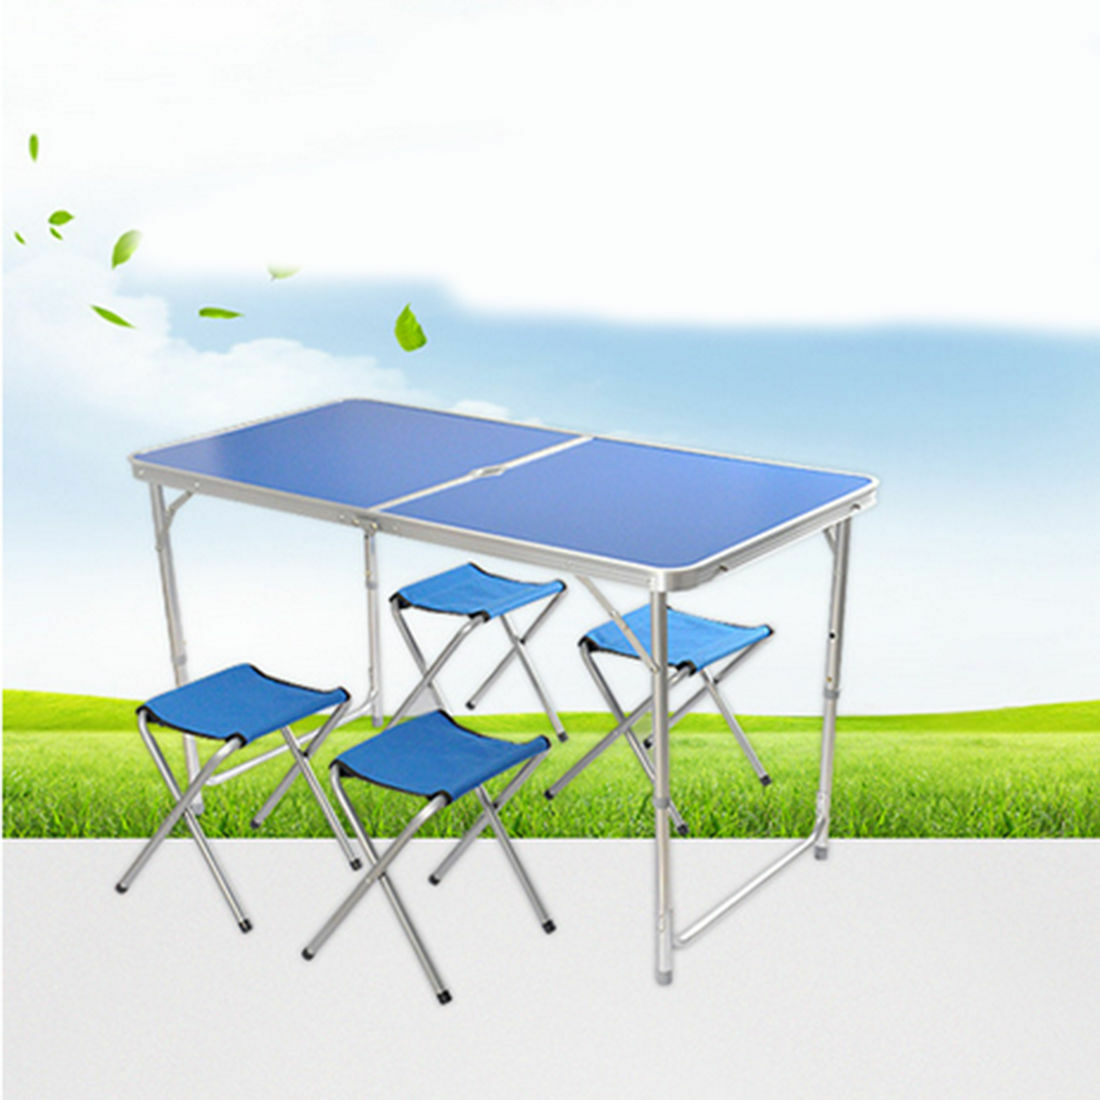 Outdoor folded table aluminium alloy wooden folded table portable picnik table